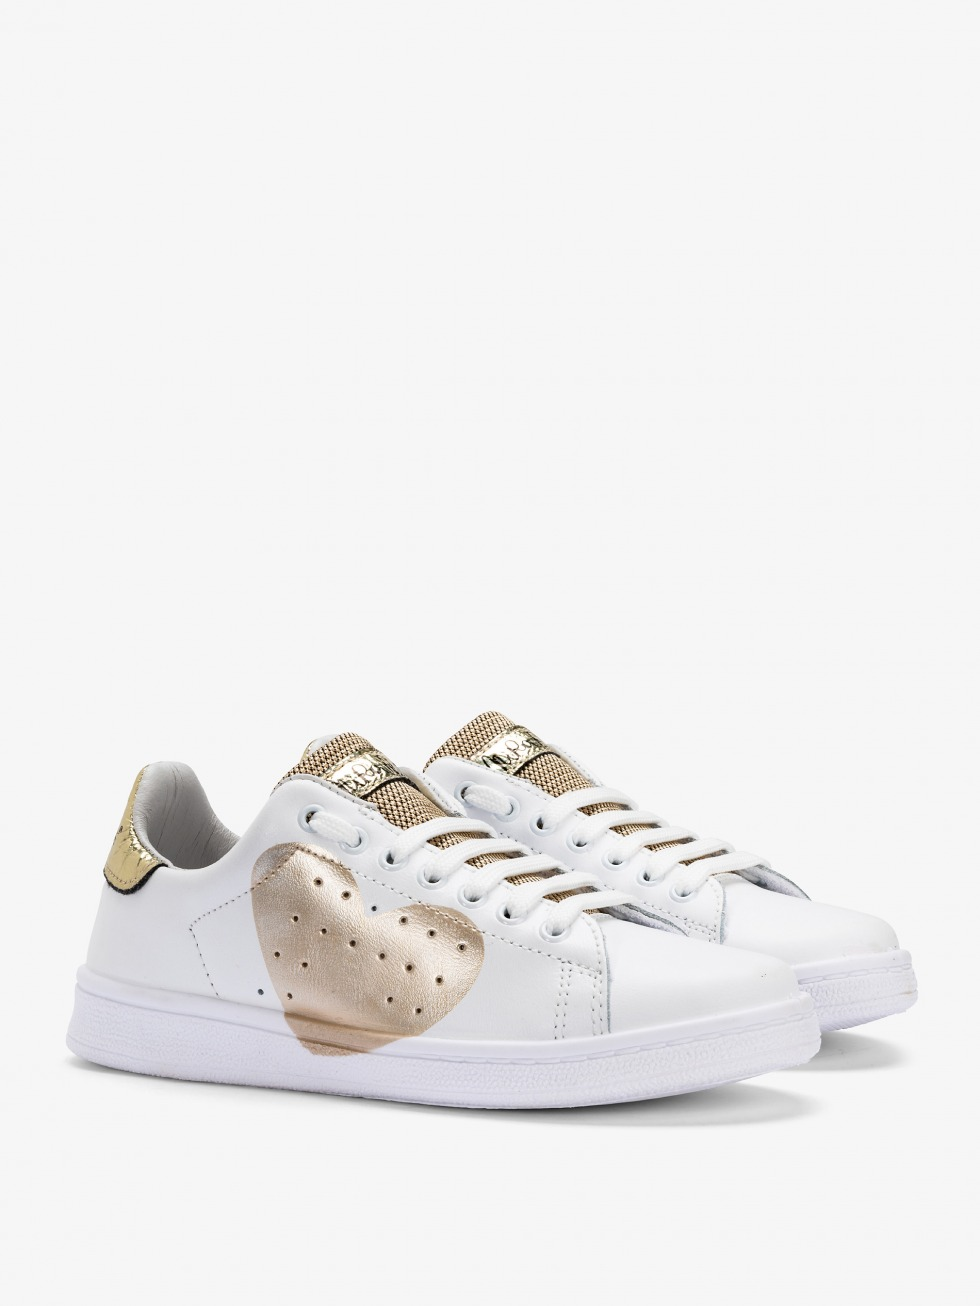 Daiquiri Sneakers - Space Gold Heart